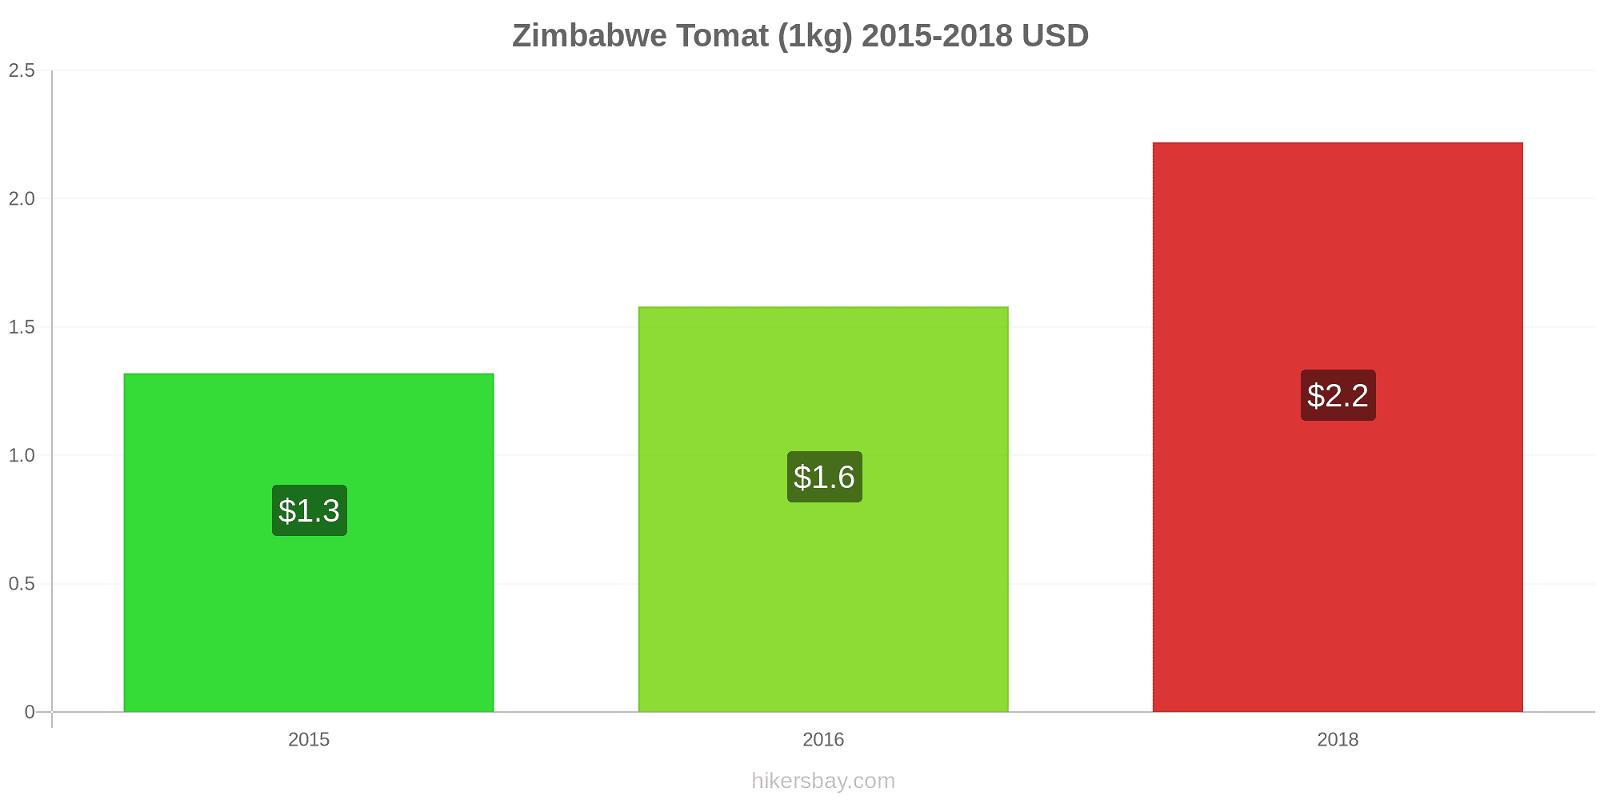 Zimbabwe prisendringer Tomat (1kg) hikersbay.com